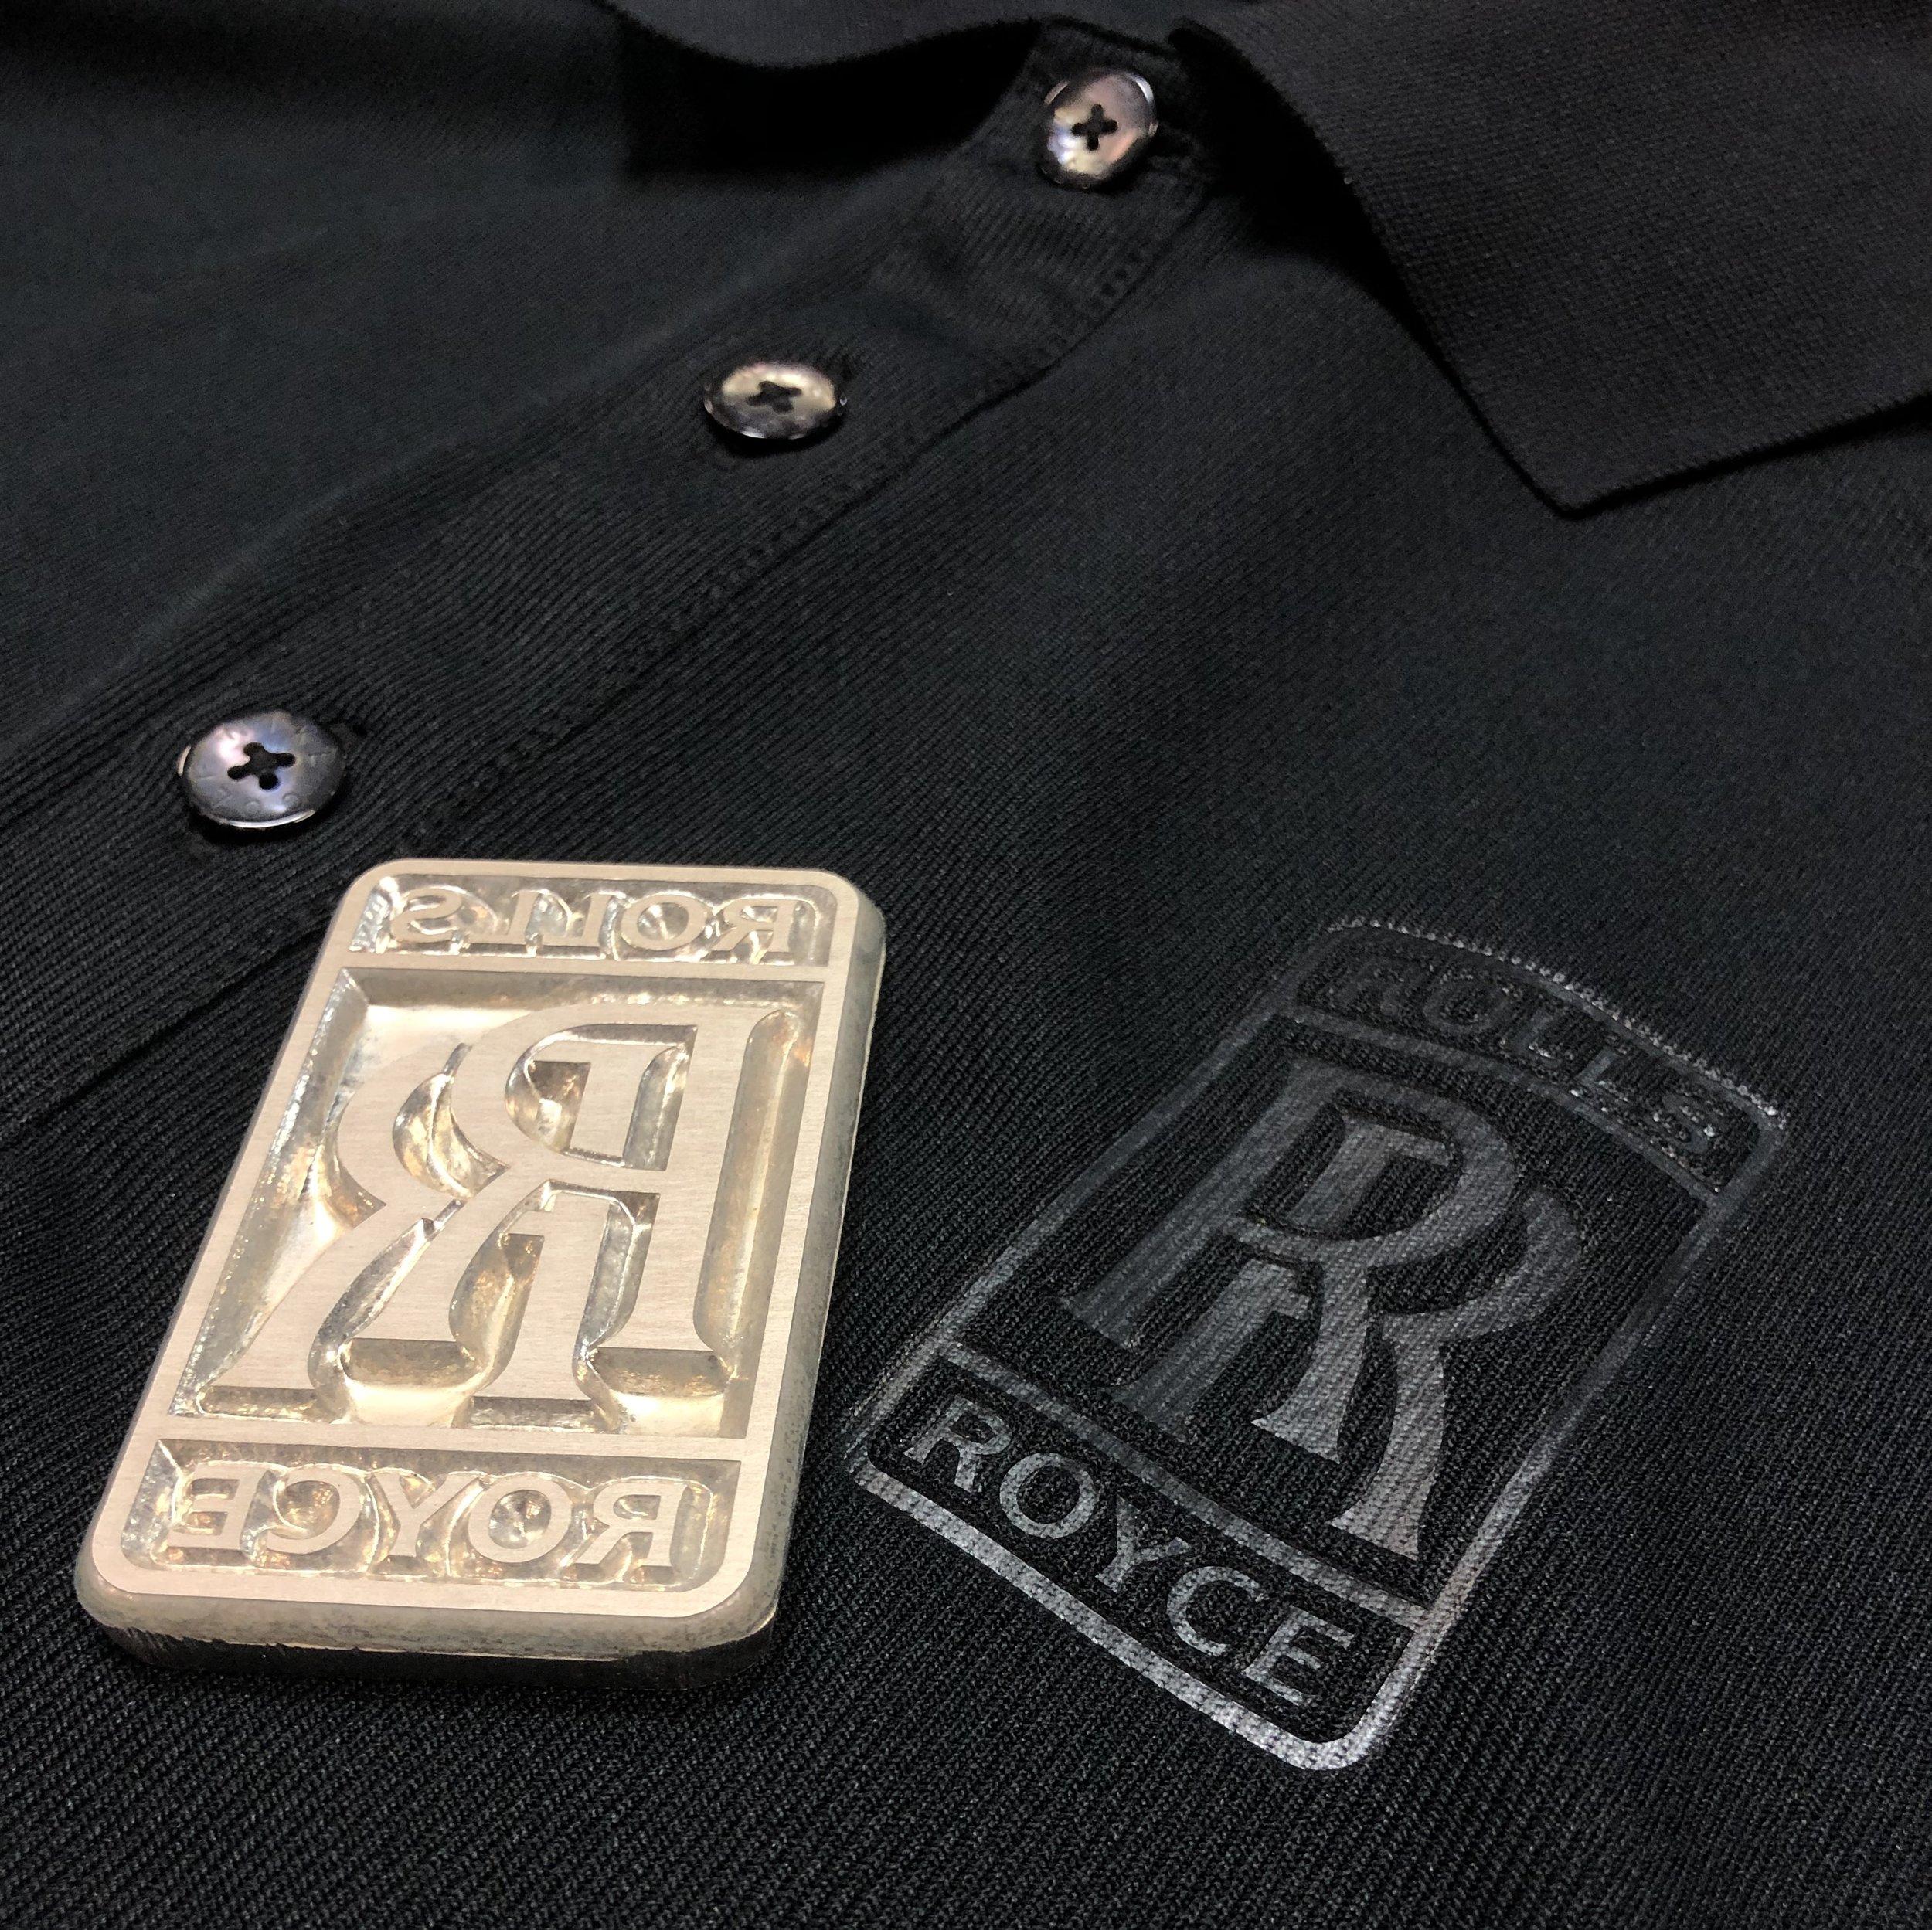 logounltd_laser_etching_embroidery_screen_printing_apparel_uniform_custom_tshirts_t_shirt_kirkland_bellevue_seattle_redmond_woodinville_branded_merchandise_promotional_products_logo_unltd_bentley_rolls_royce (.jpg